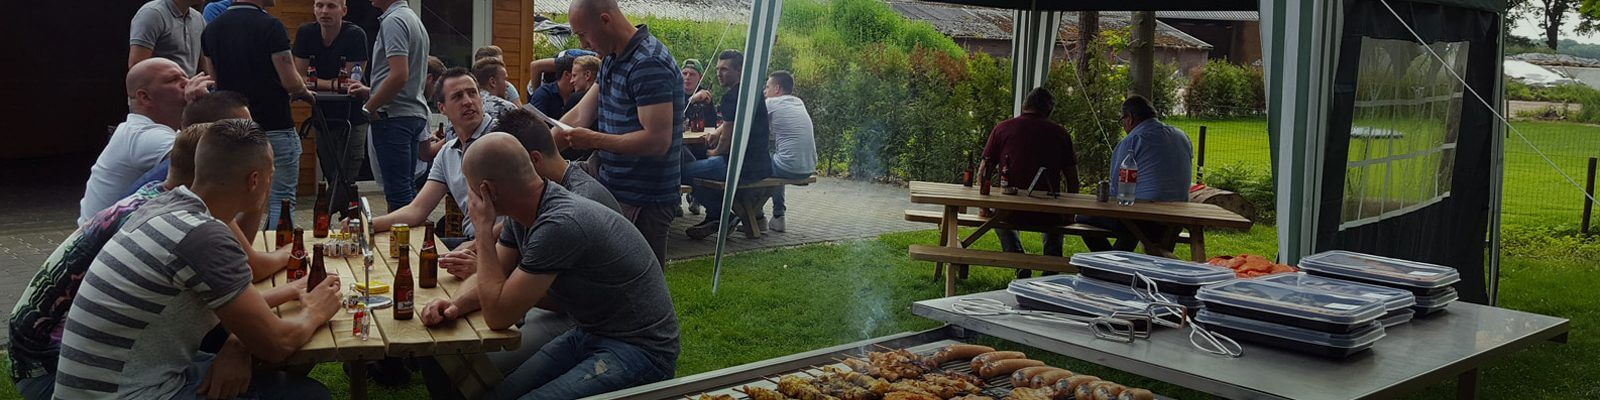 Liever Buiten barbecue